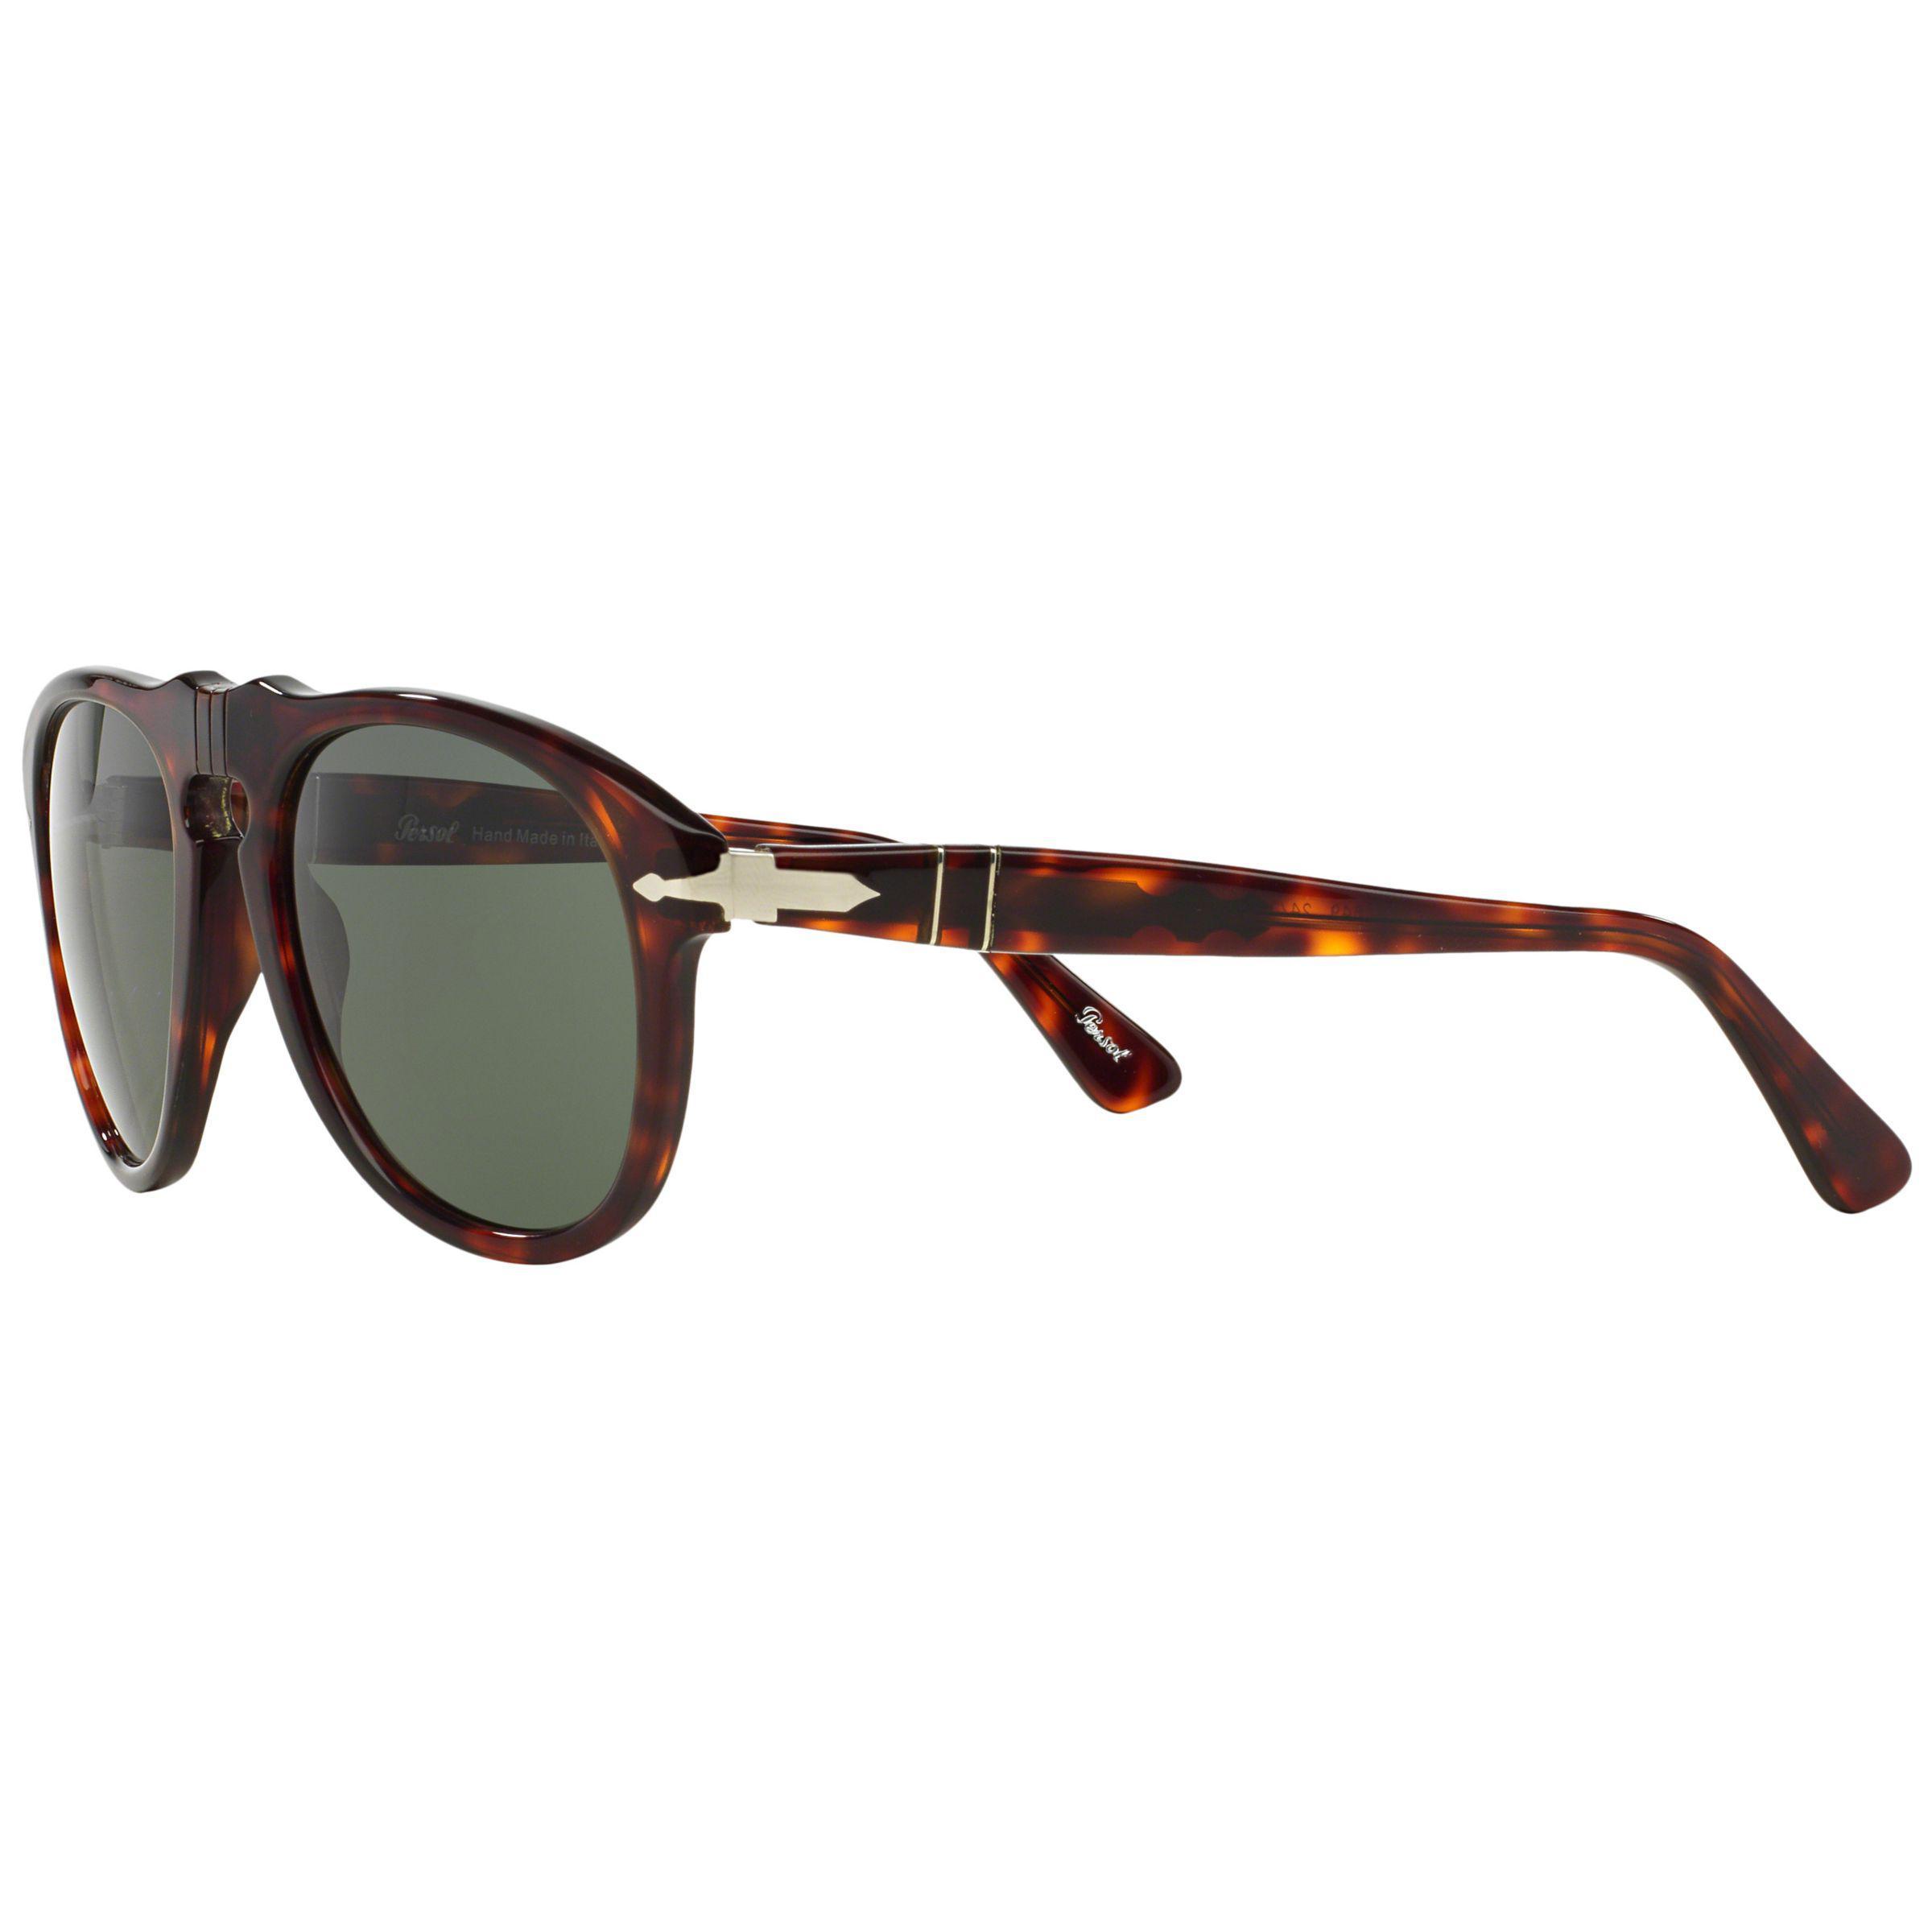 31783186db46 John Lewis Persol Po0649 Aviator Sunglasses in Gray for Men - Lyst